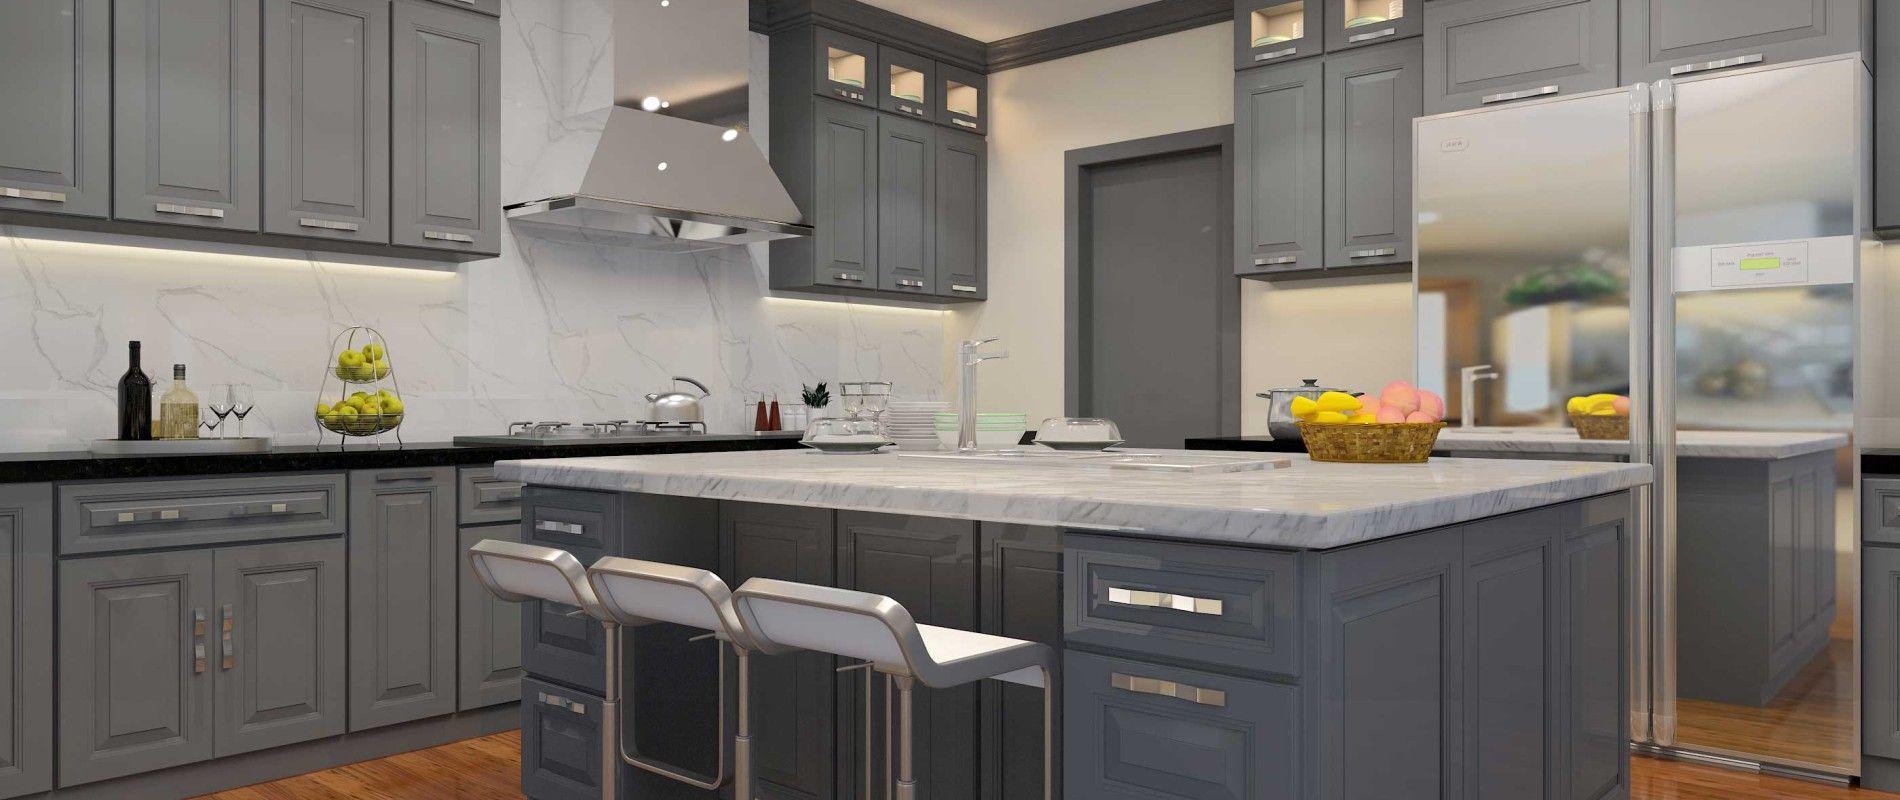 Belmont Gibraltar Gray1 Grey Painted Kitchen Kitchen Cabinets Painted Grey Assembled Kitchen Cabinets